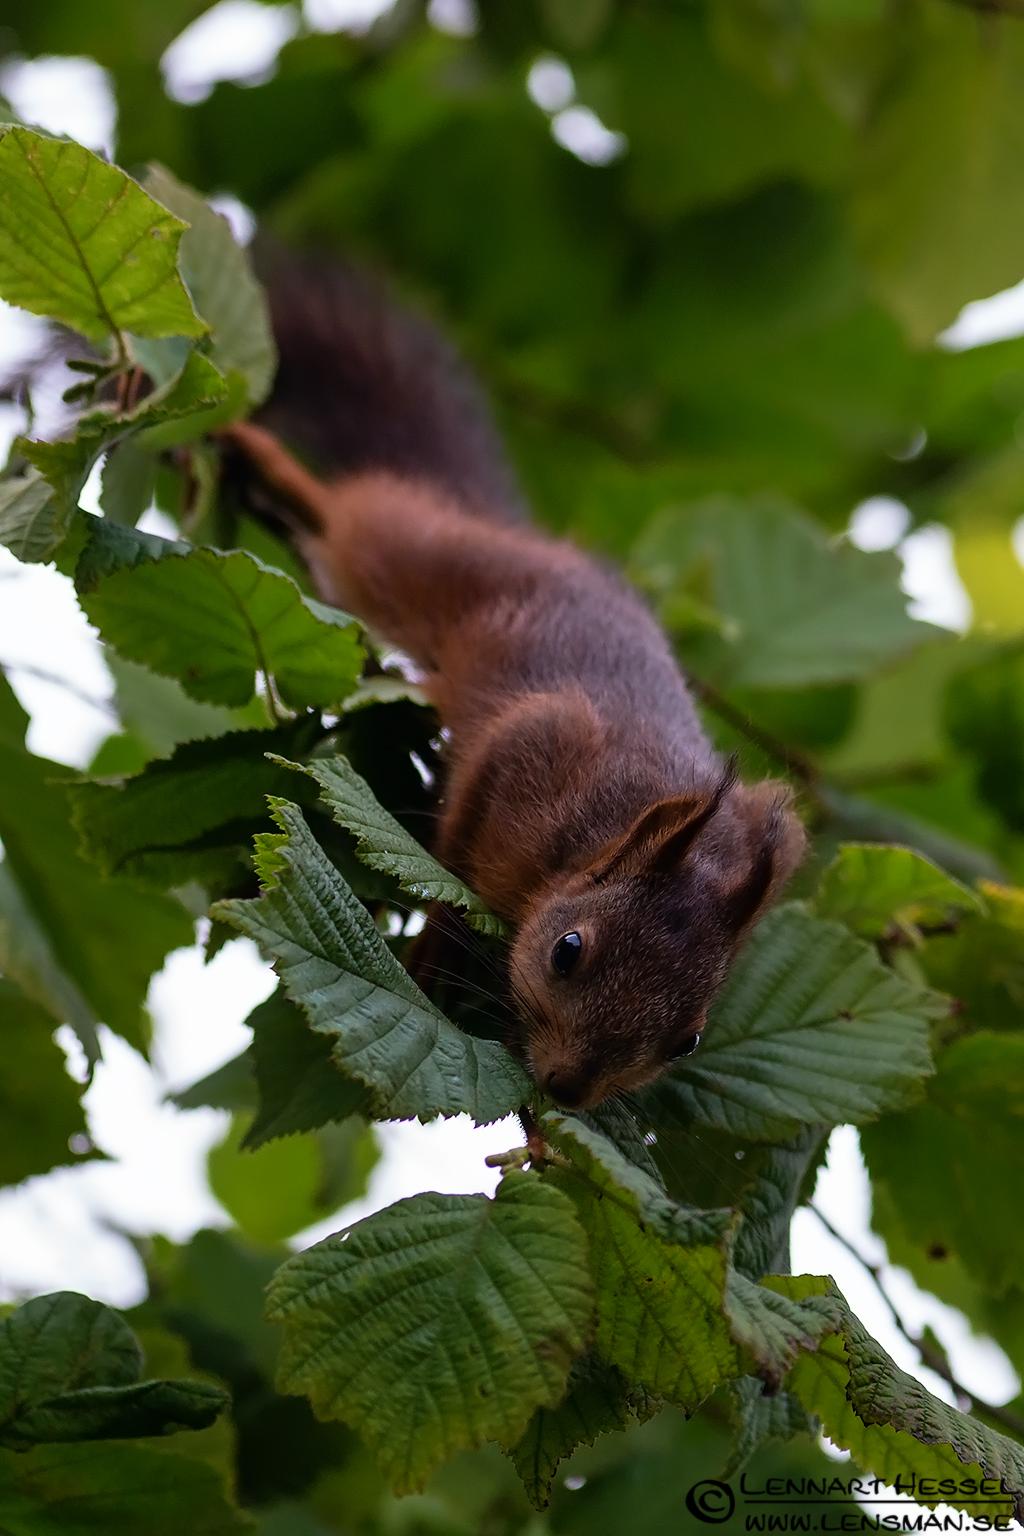 Red squirrel climbing down, botanical